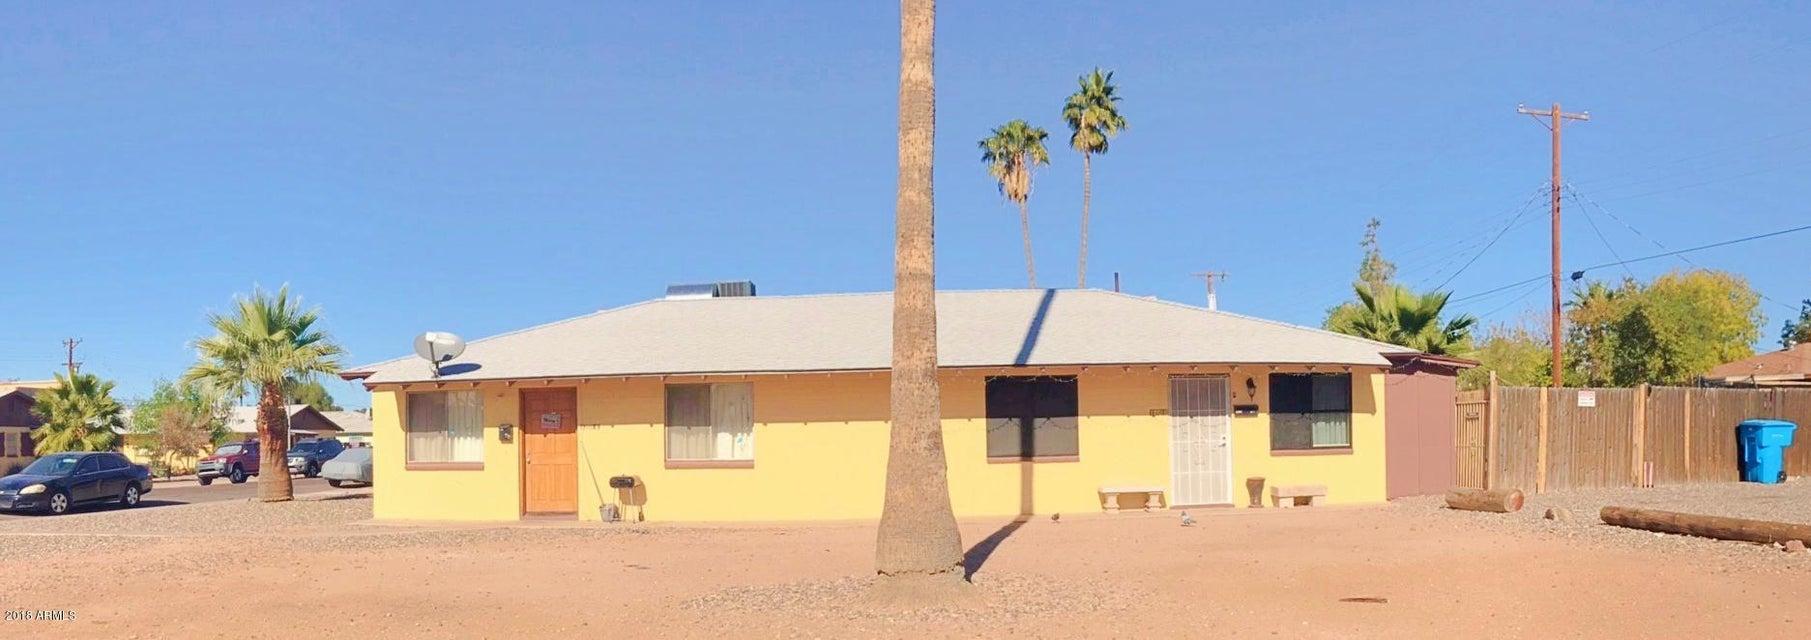 1201 N 49TH Street Phoenix, AZ 85008 - MLS #: 5706733